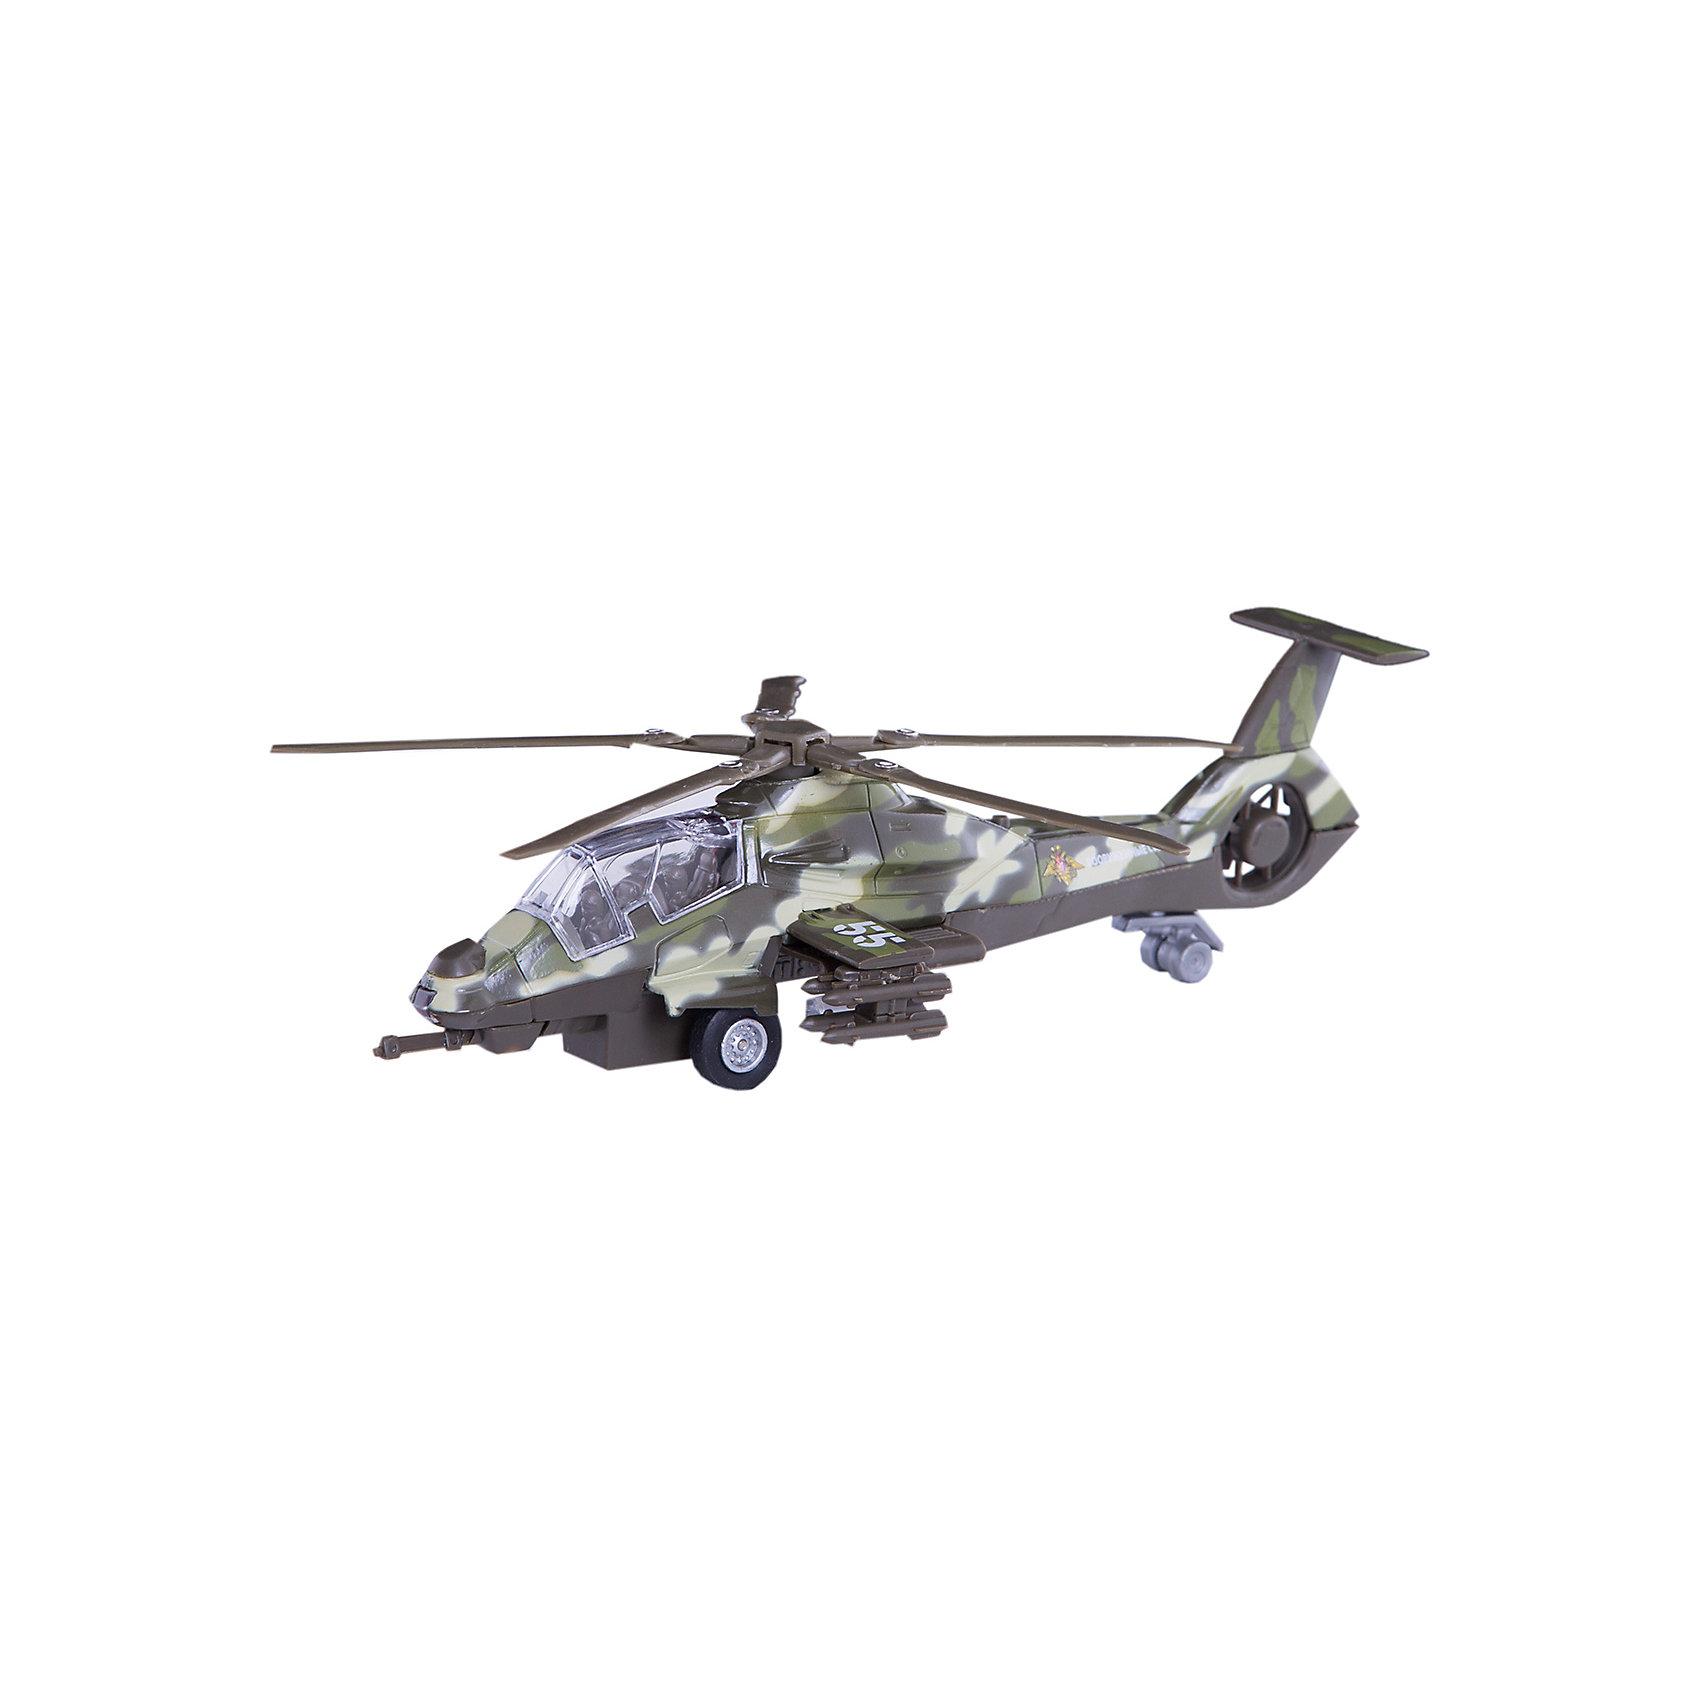 ТЕХНОПАРК ТЕХНОПАРК Военный вертолёт технопарк пожарная машина со светом и звуком технопарк